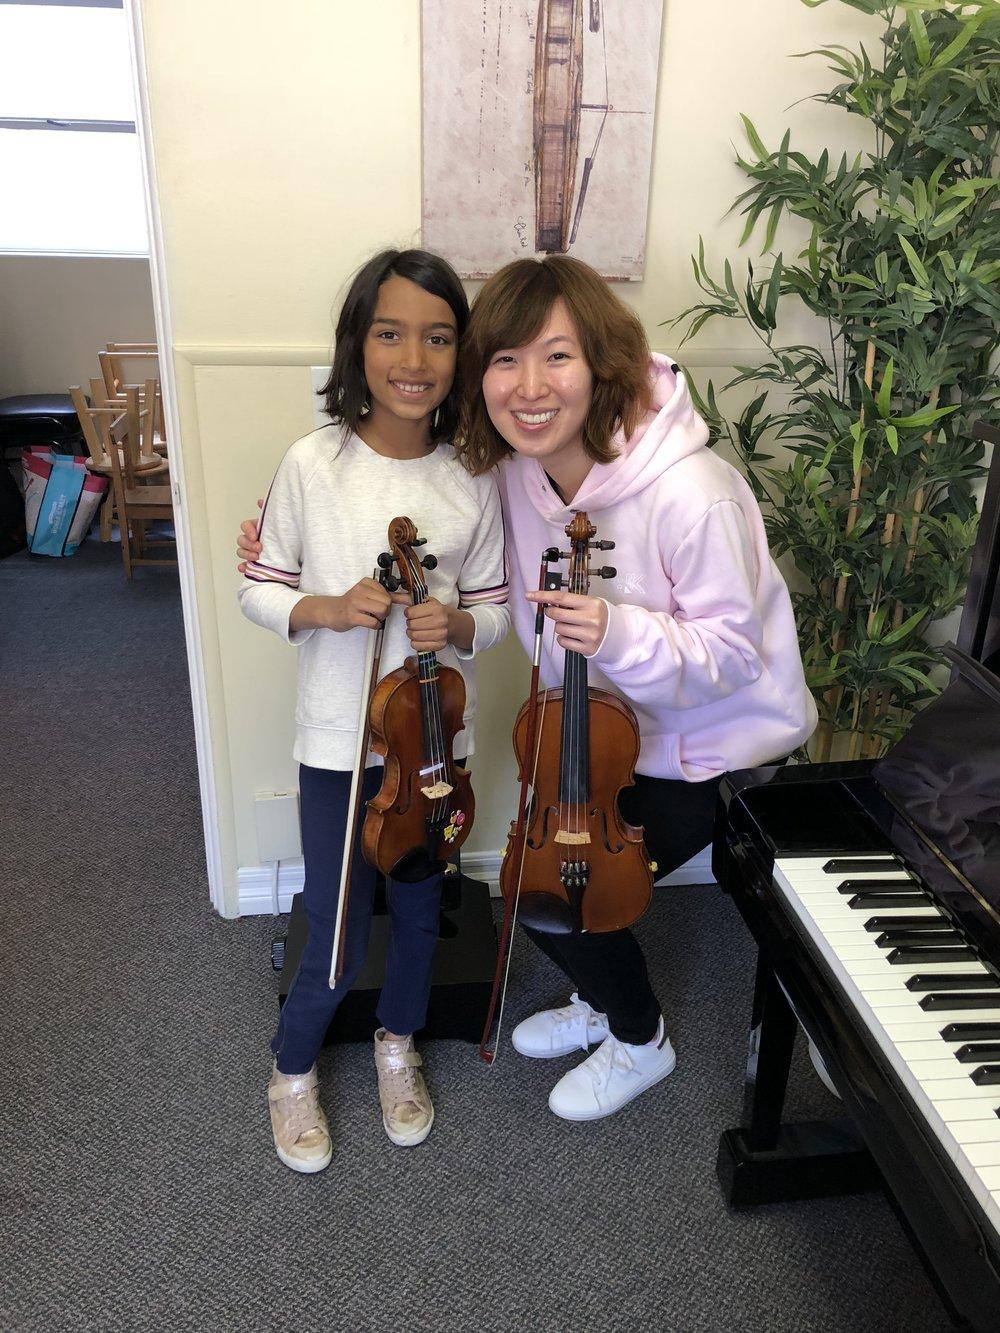 Redwood City Violin Lessons, Redwood City Guitar Lessons